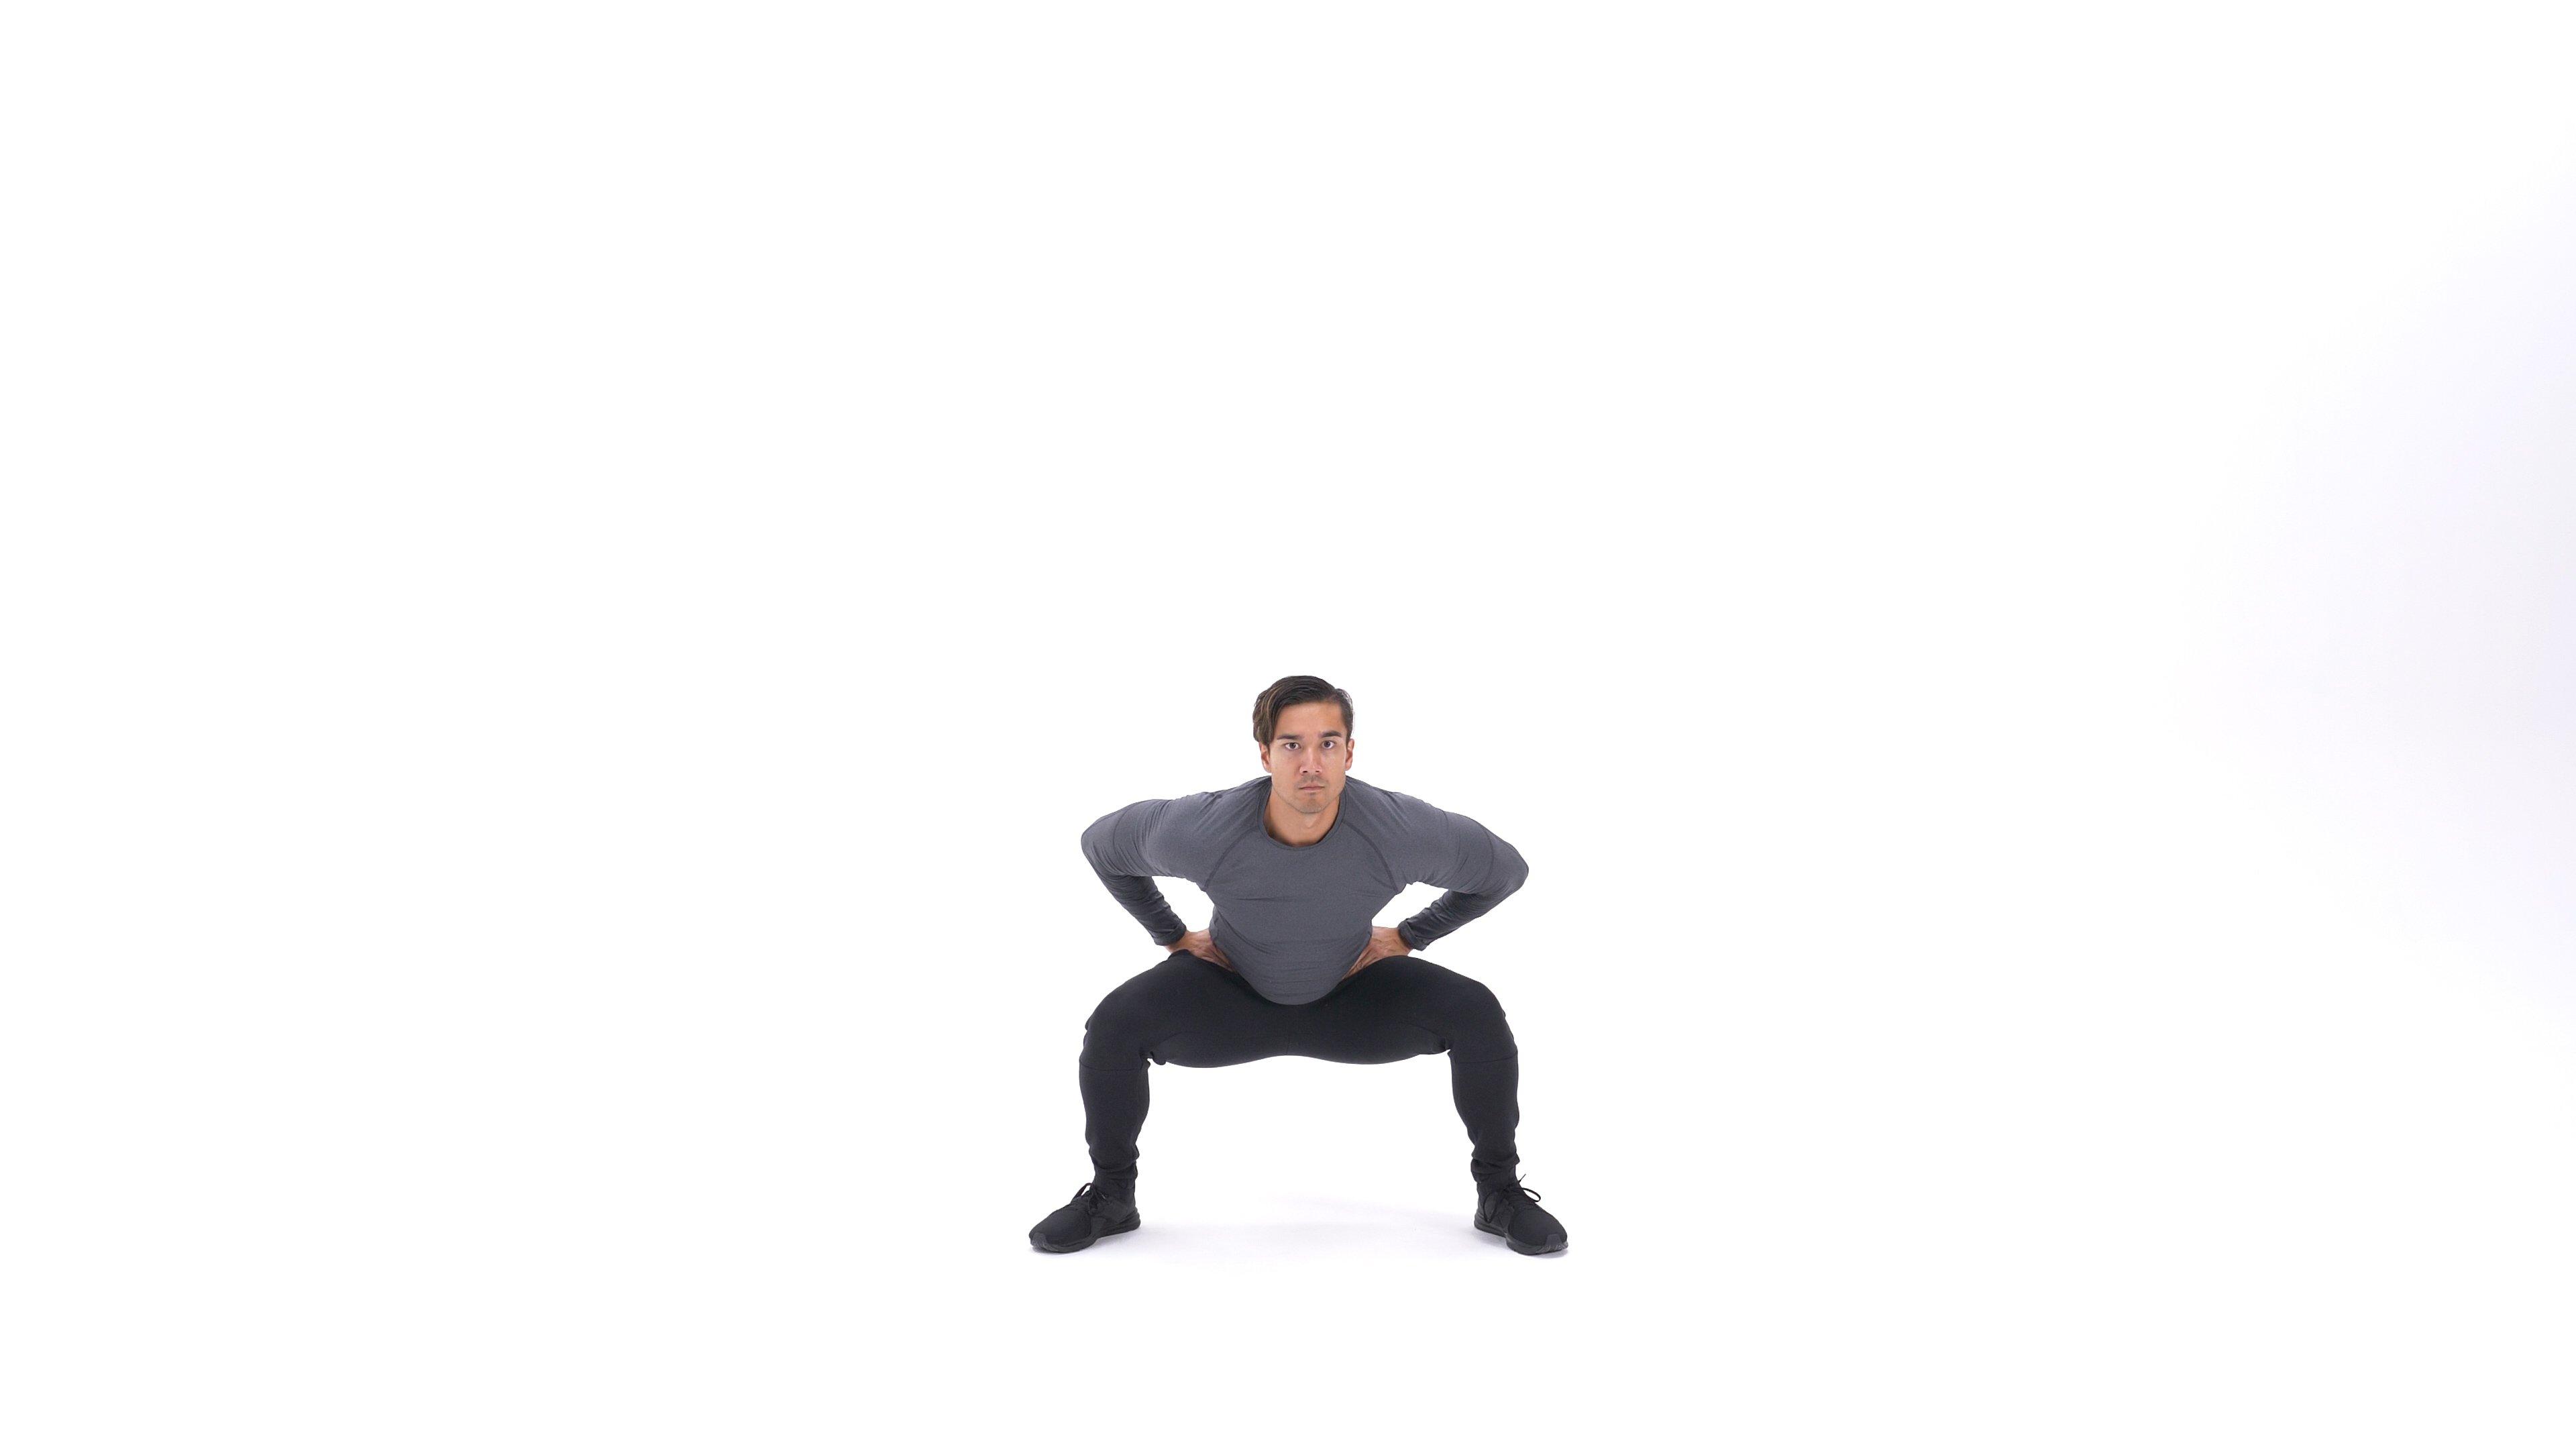 Pop squat image